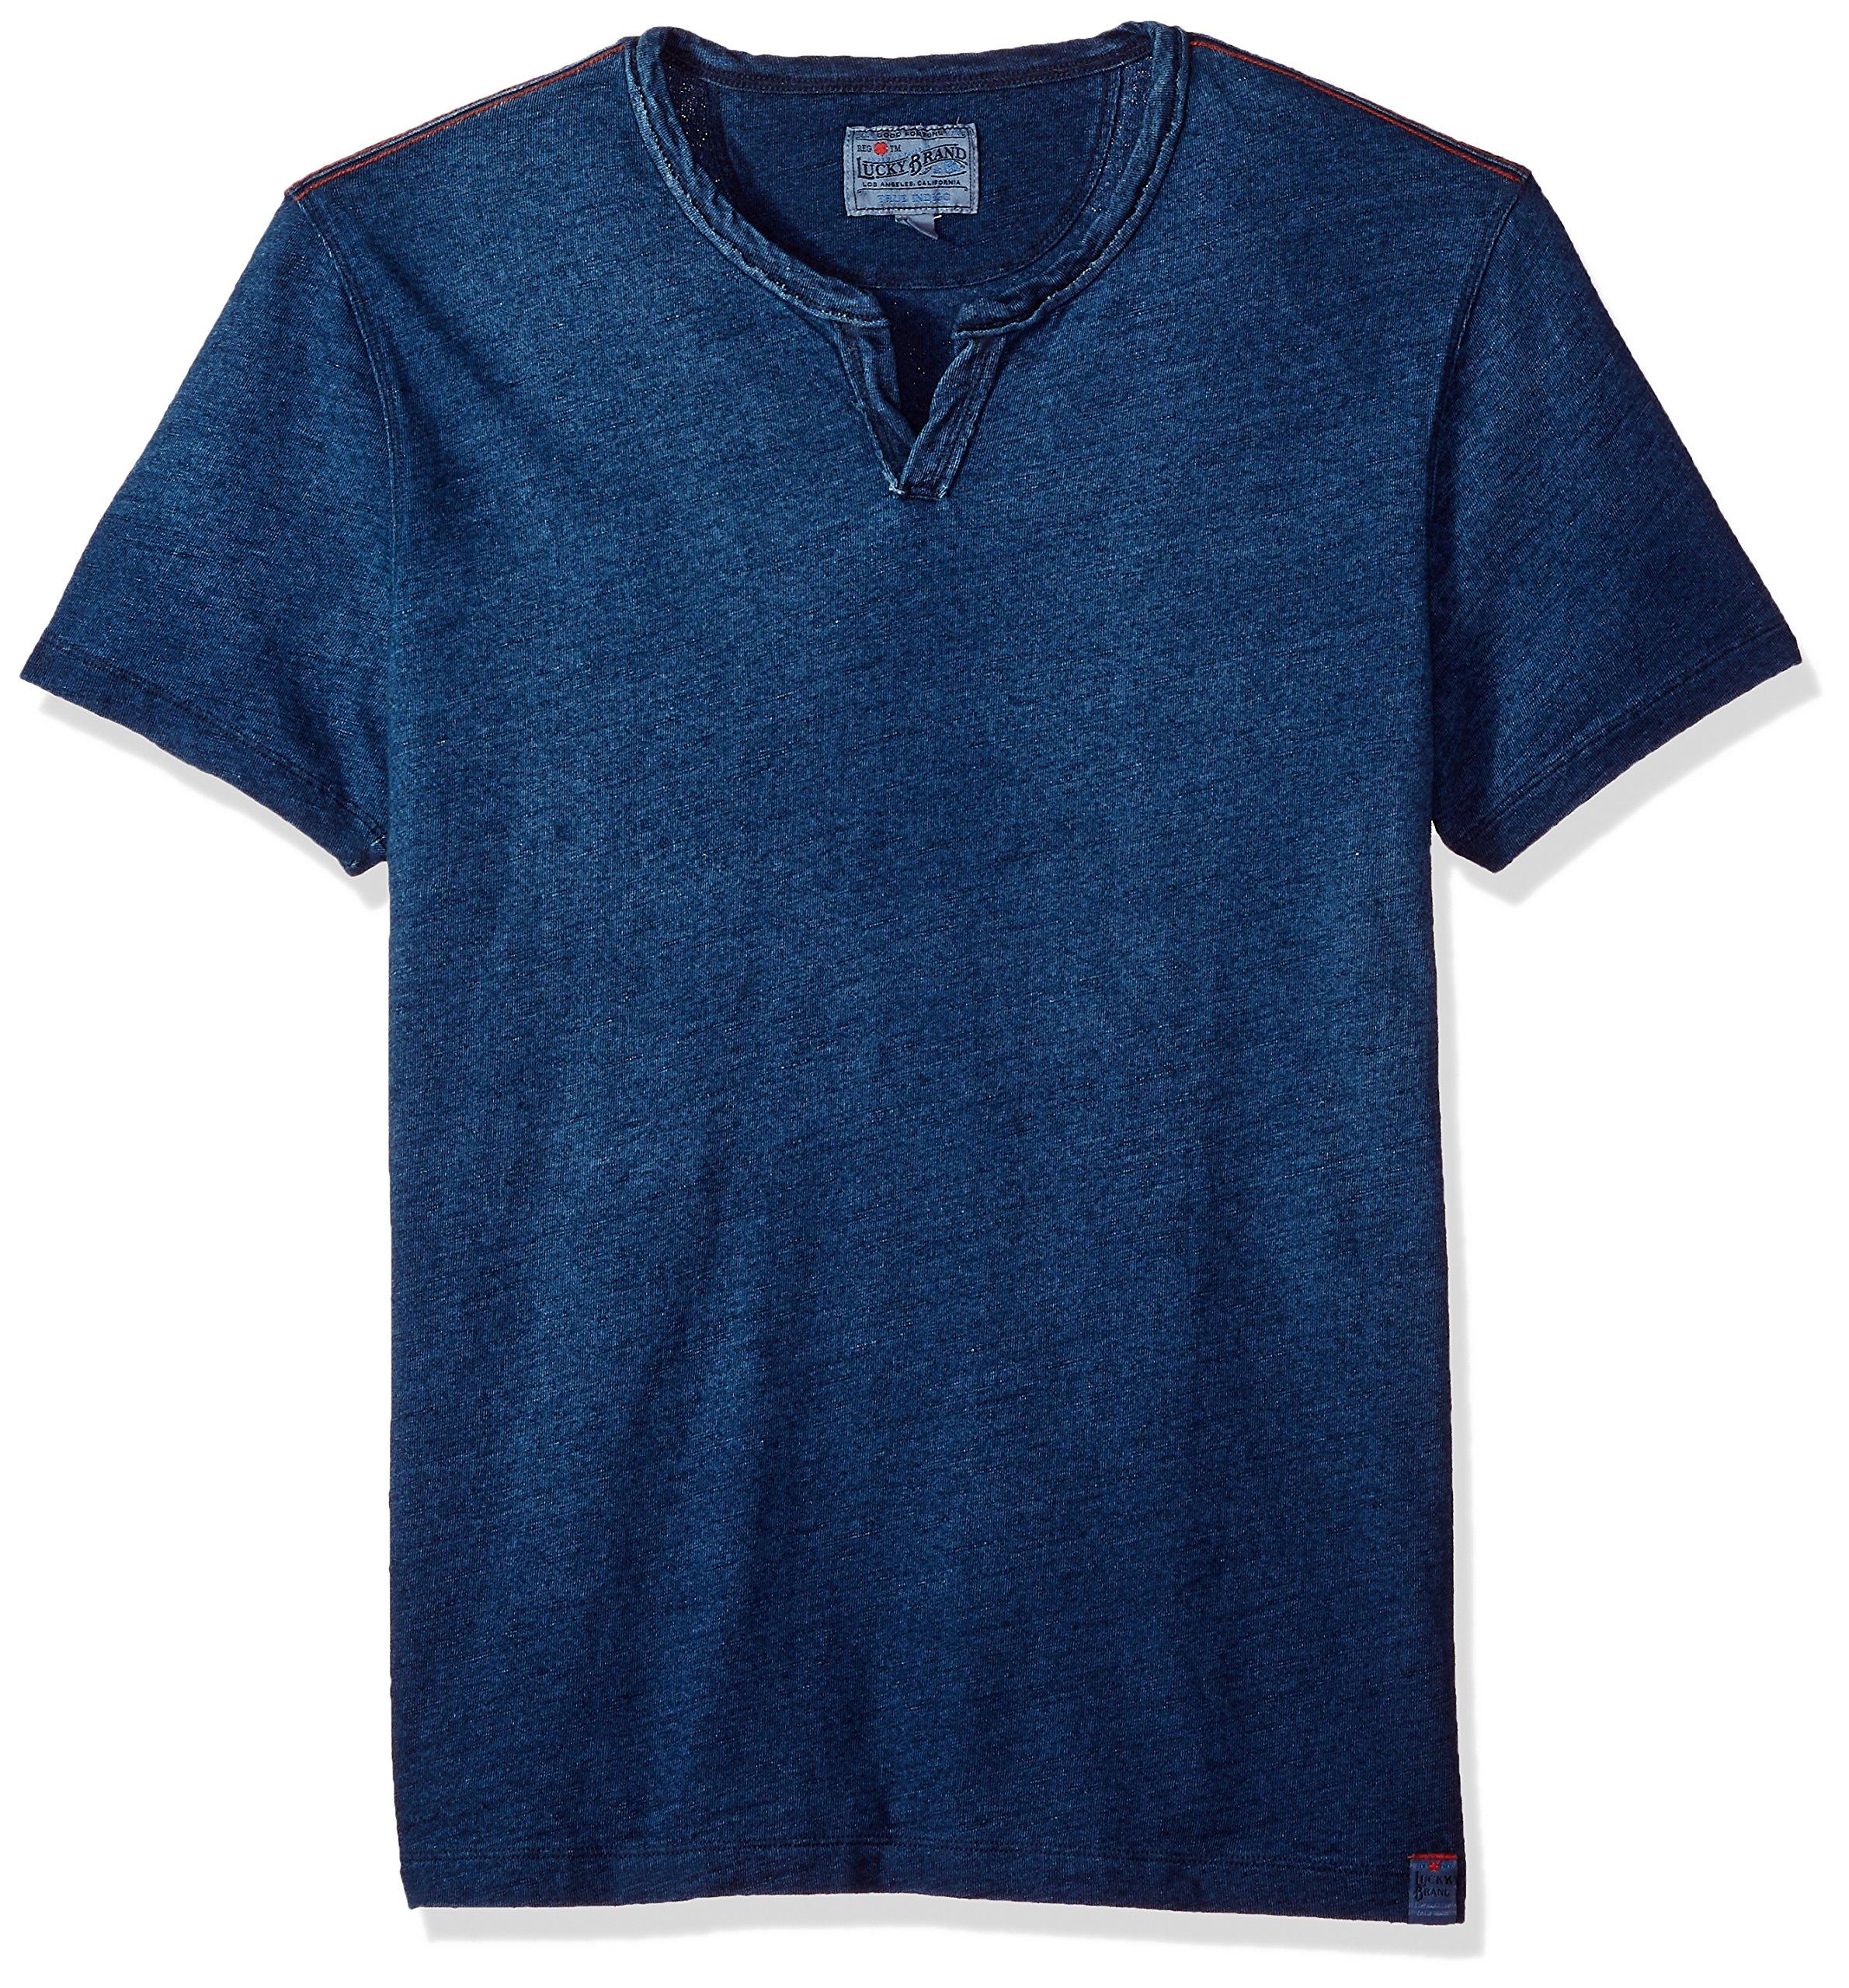 Lucky Brand Men's Notch Neck TEE Shirt, Medium Indigo, M